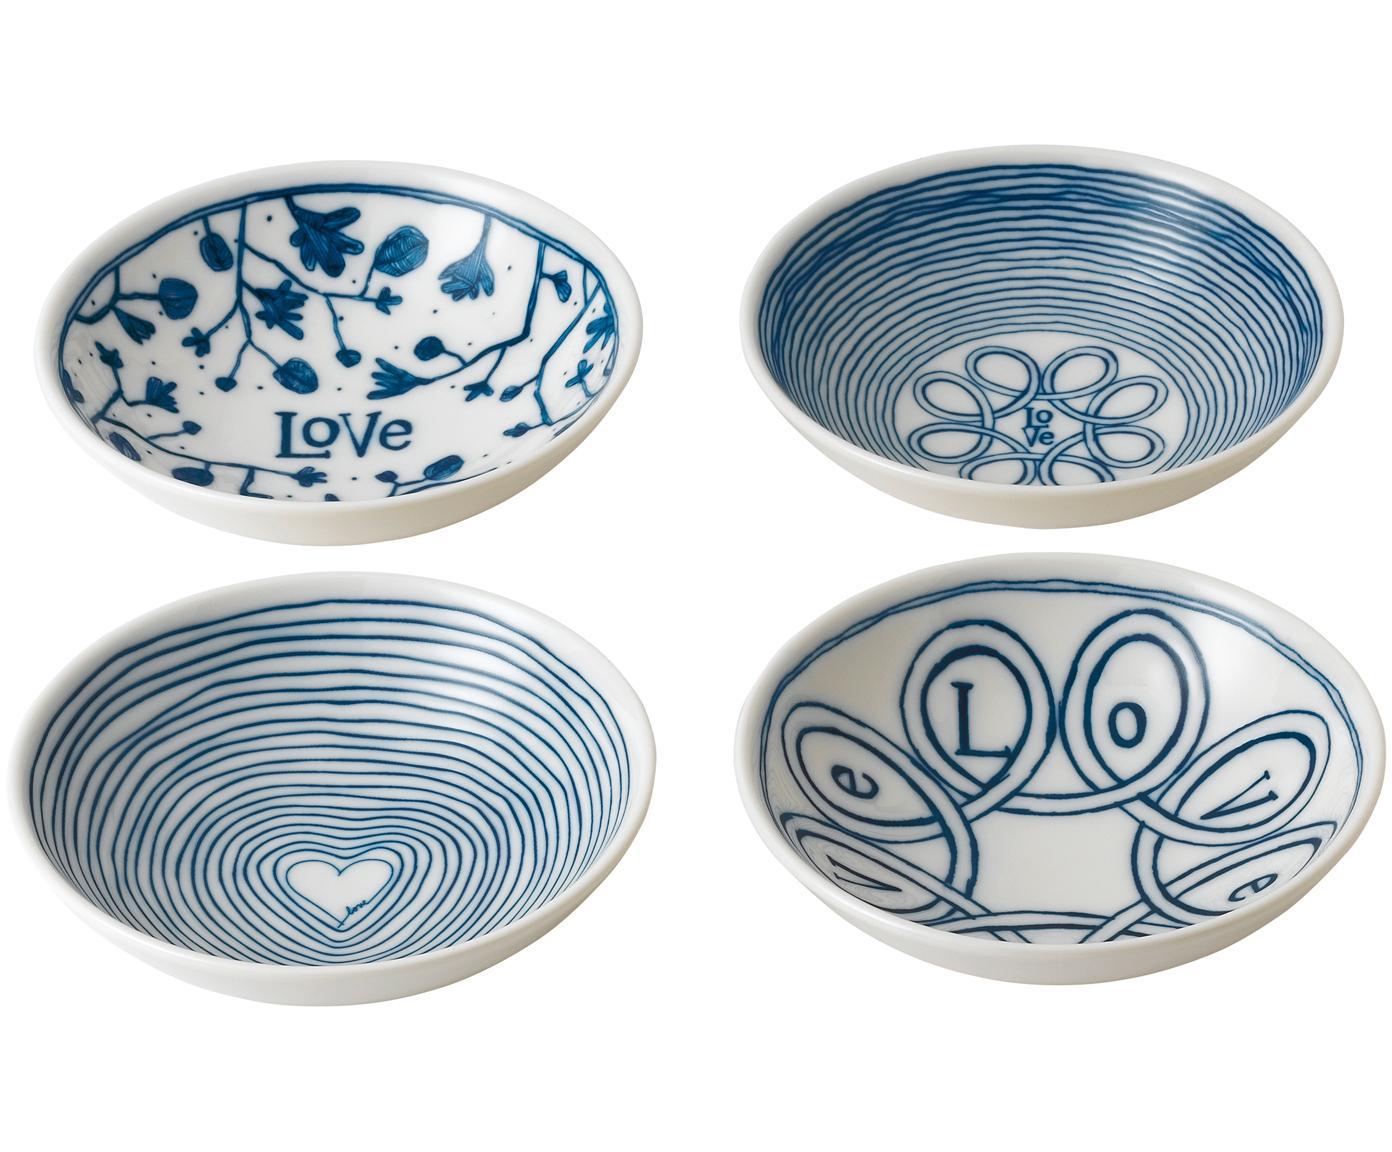 Set ciotole Love, 4 pz., Porcellana, Avorio, cobaltico, Ø 14 x A 4 cm